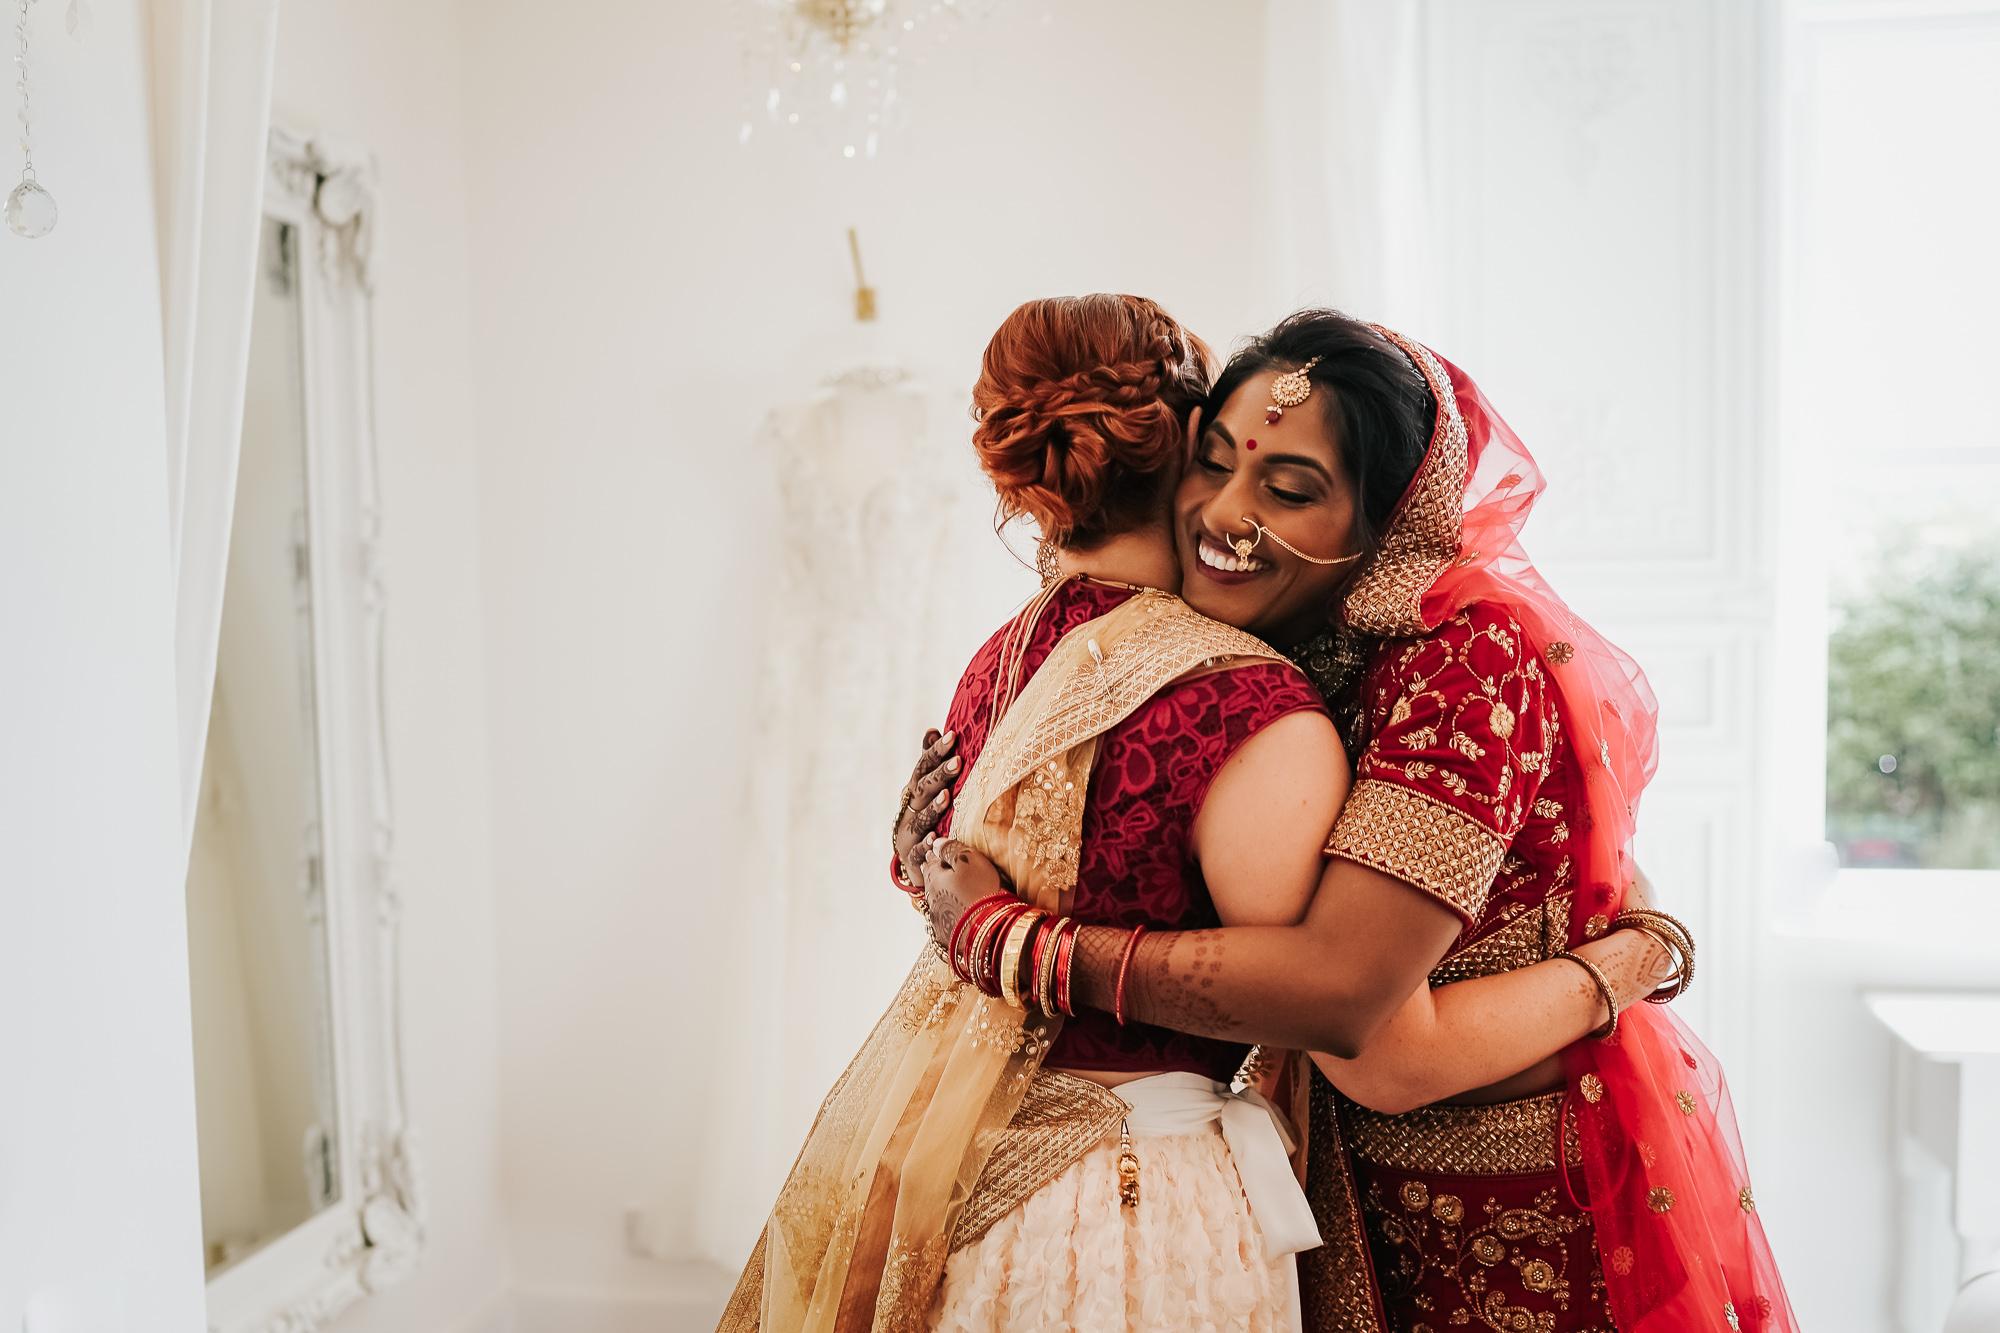 Alcumlow Hall Farm Indian Wedding Photographer (10 of 44).jpg